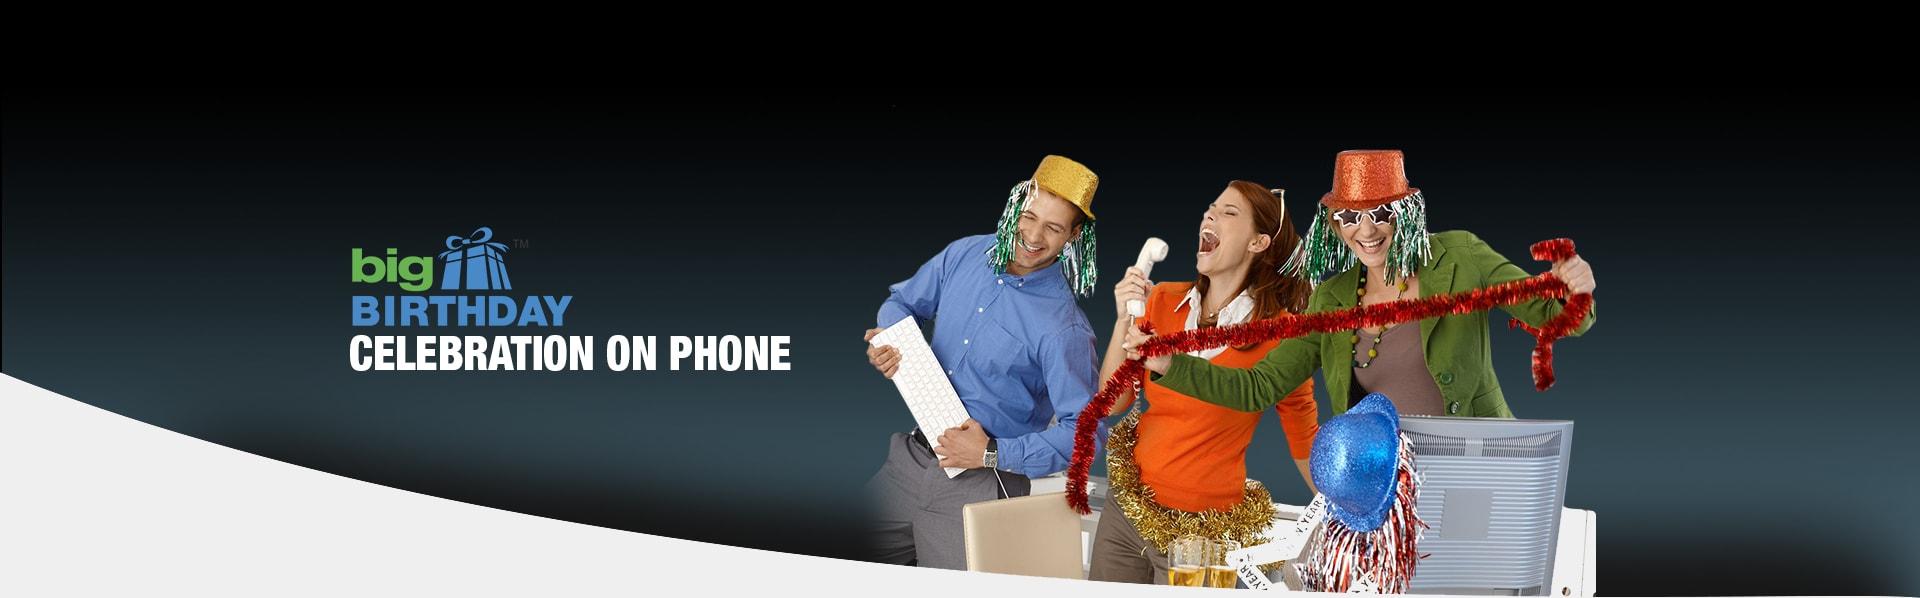 Big V Telecom - Big Birthday